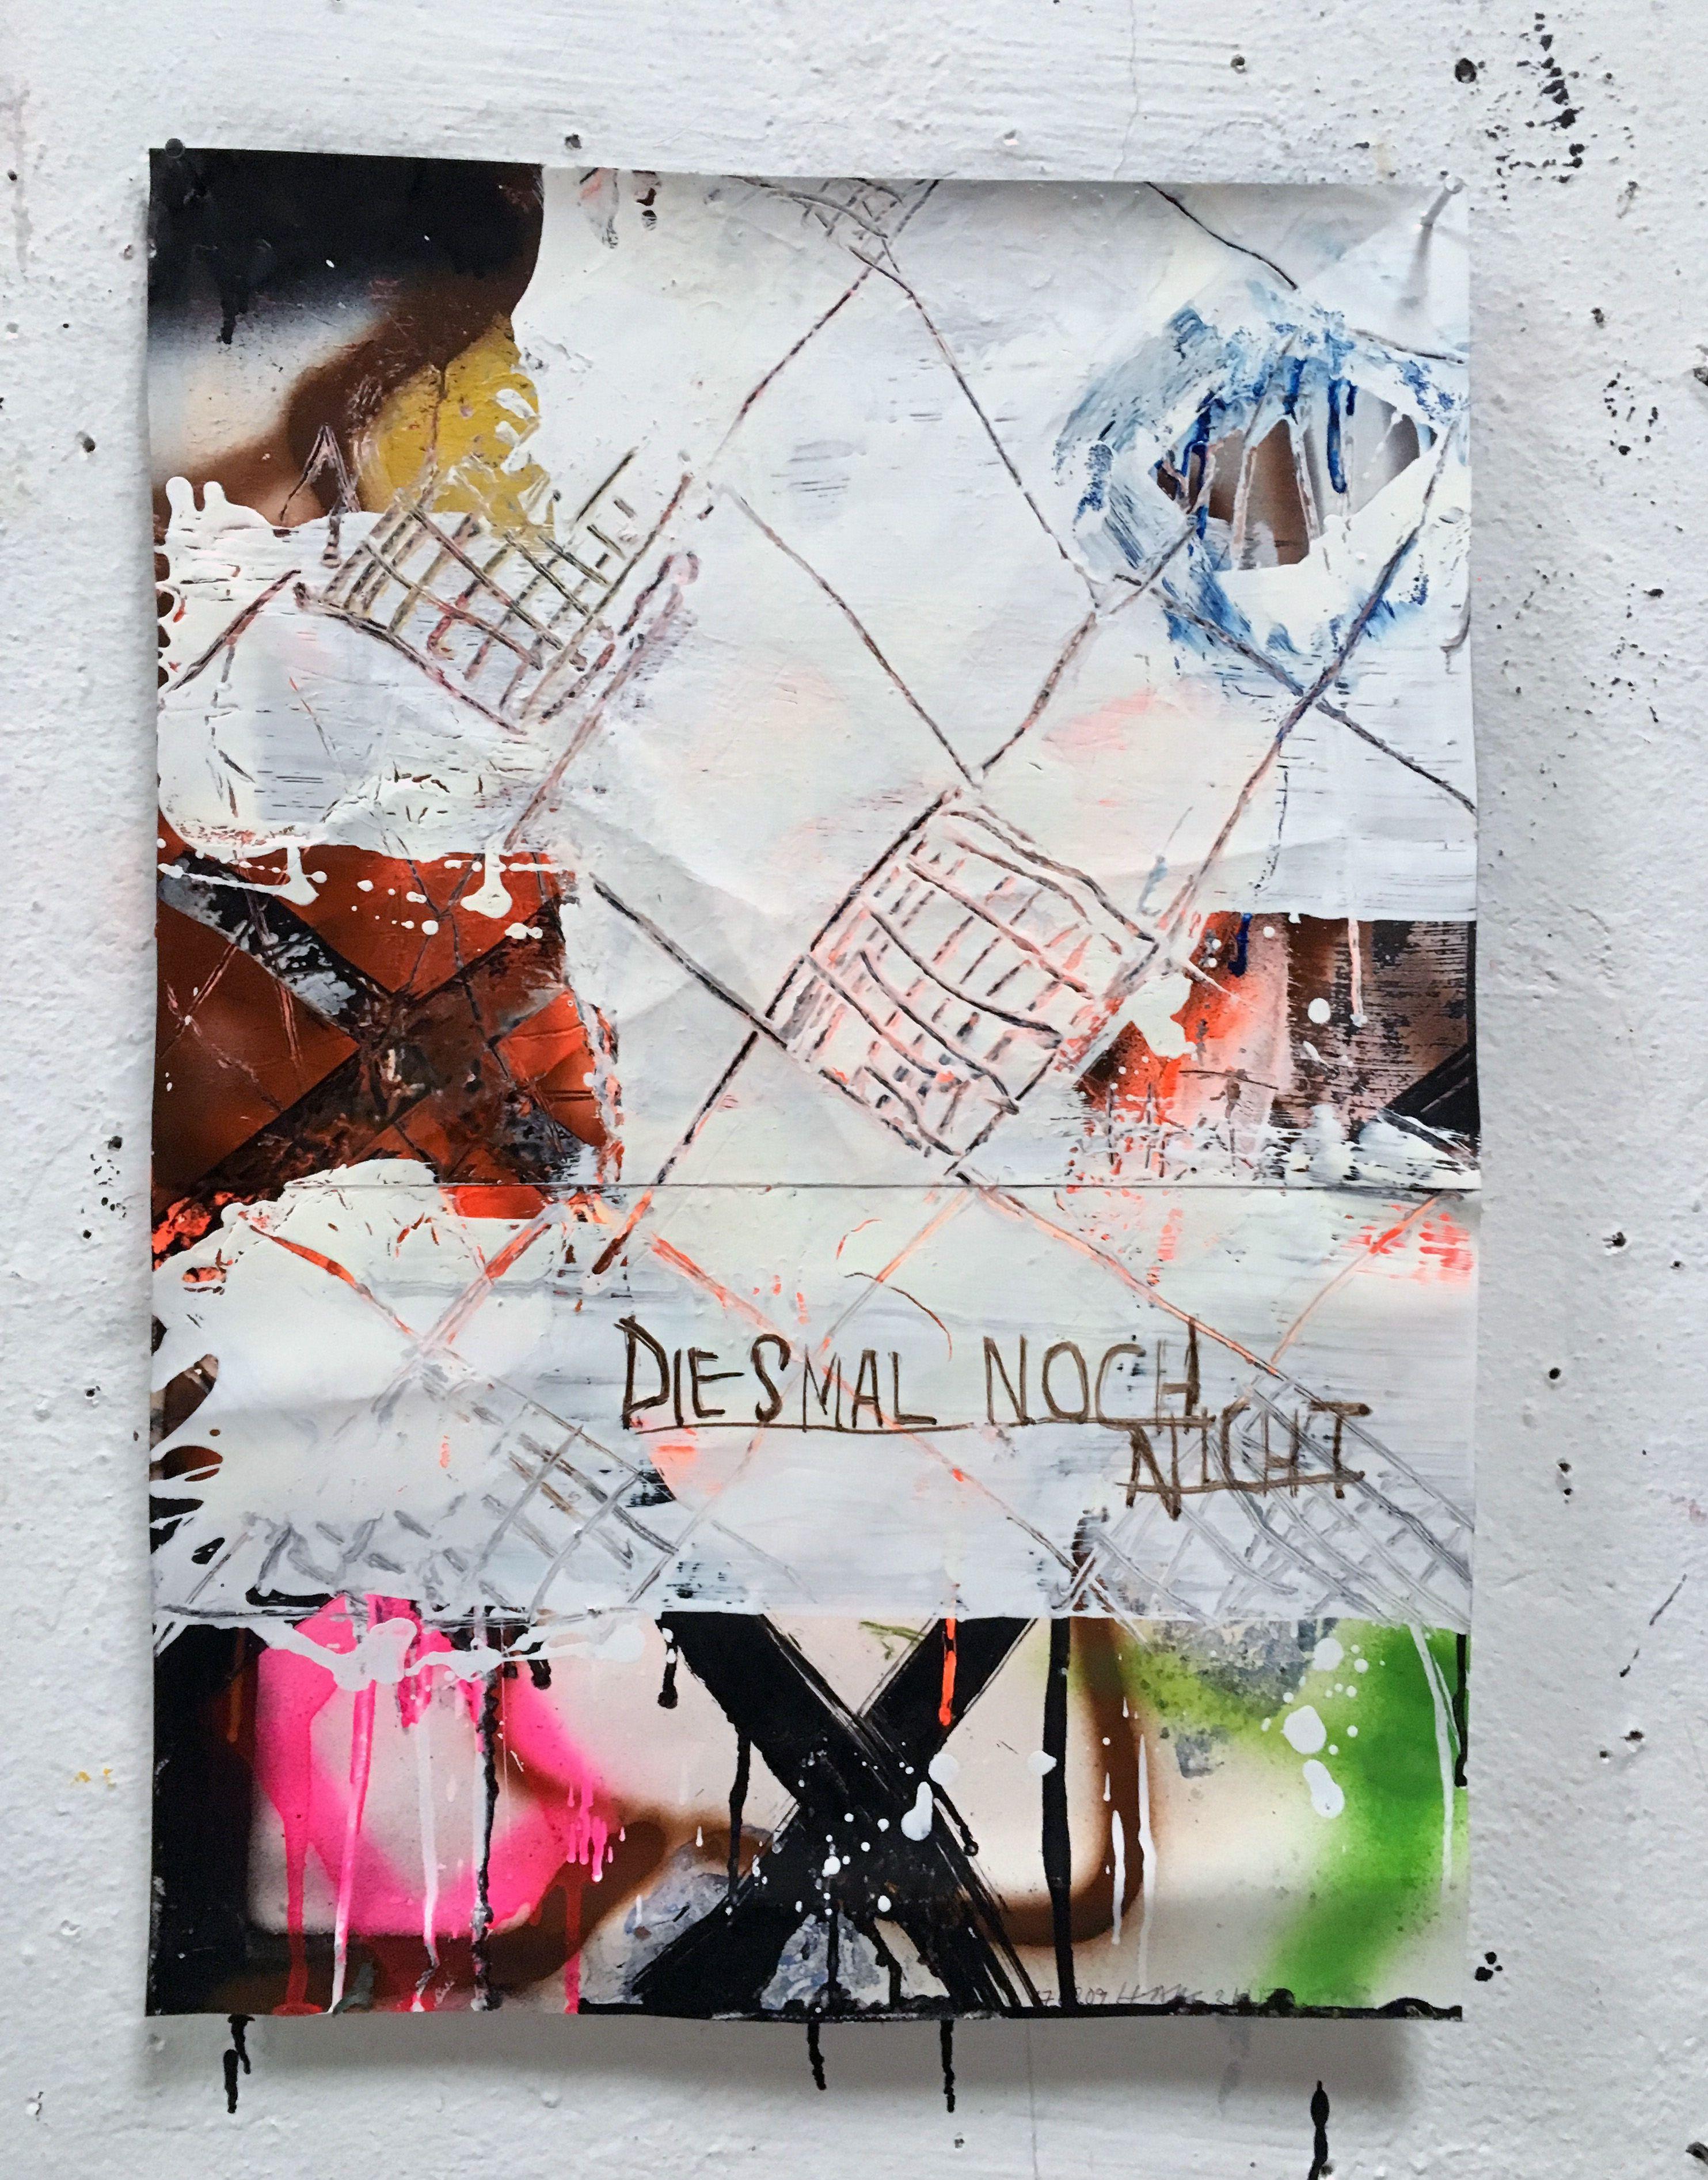 Hermann Josef Hack, DIESMAL NOCH NICHT, 170209, painting and spray paint on tarpaulin, 63 x 45 cm, 2017